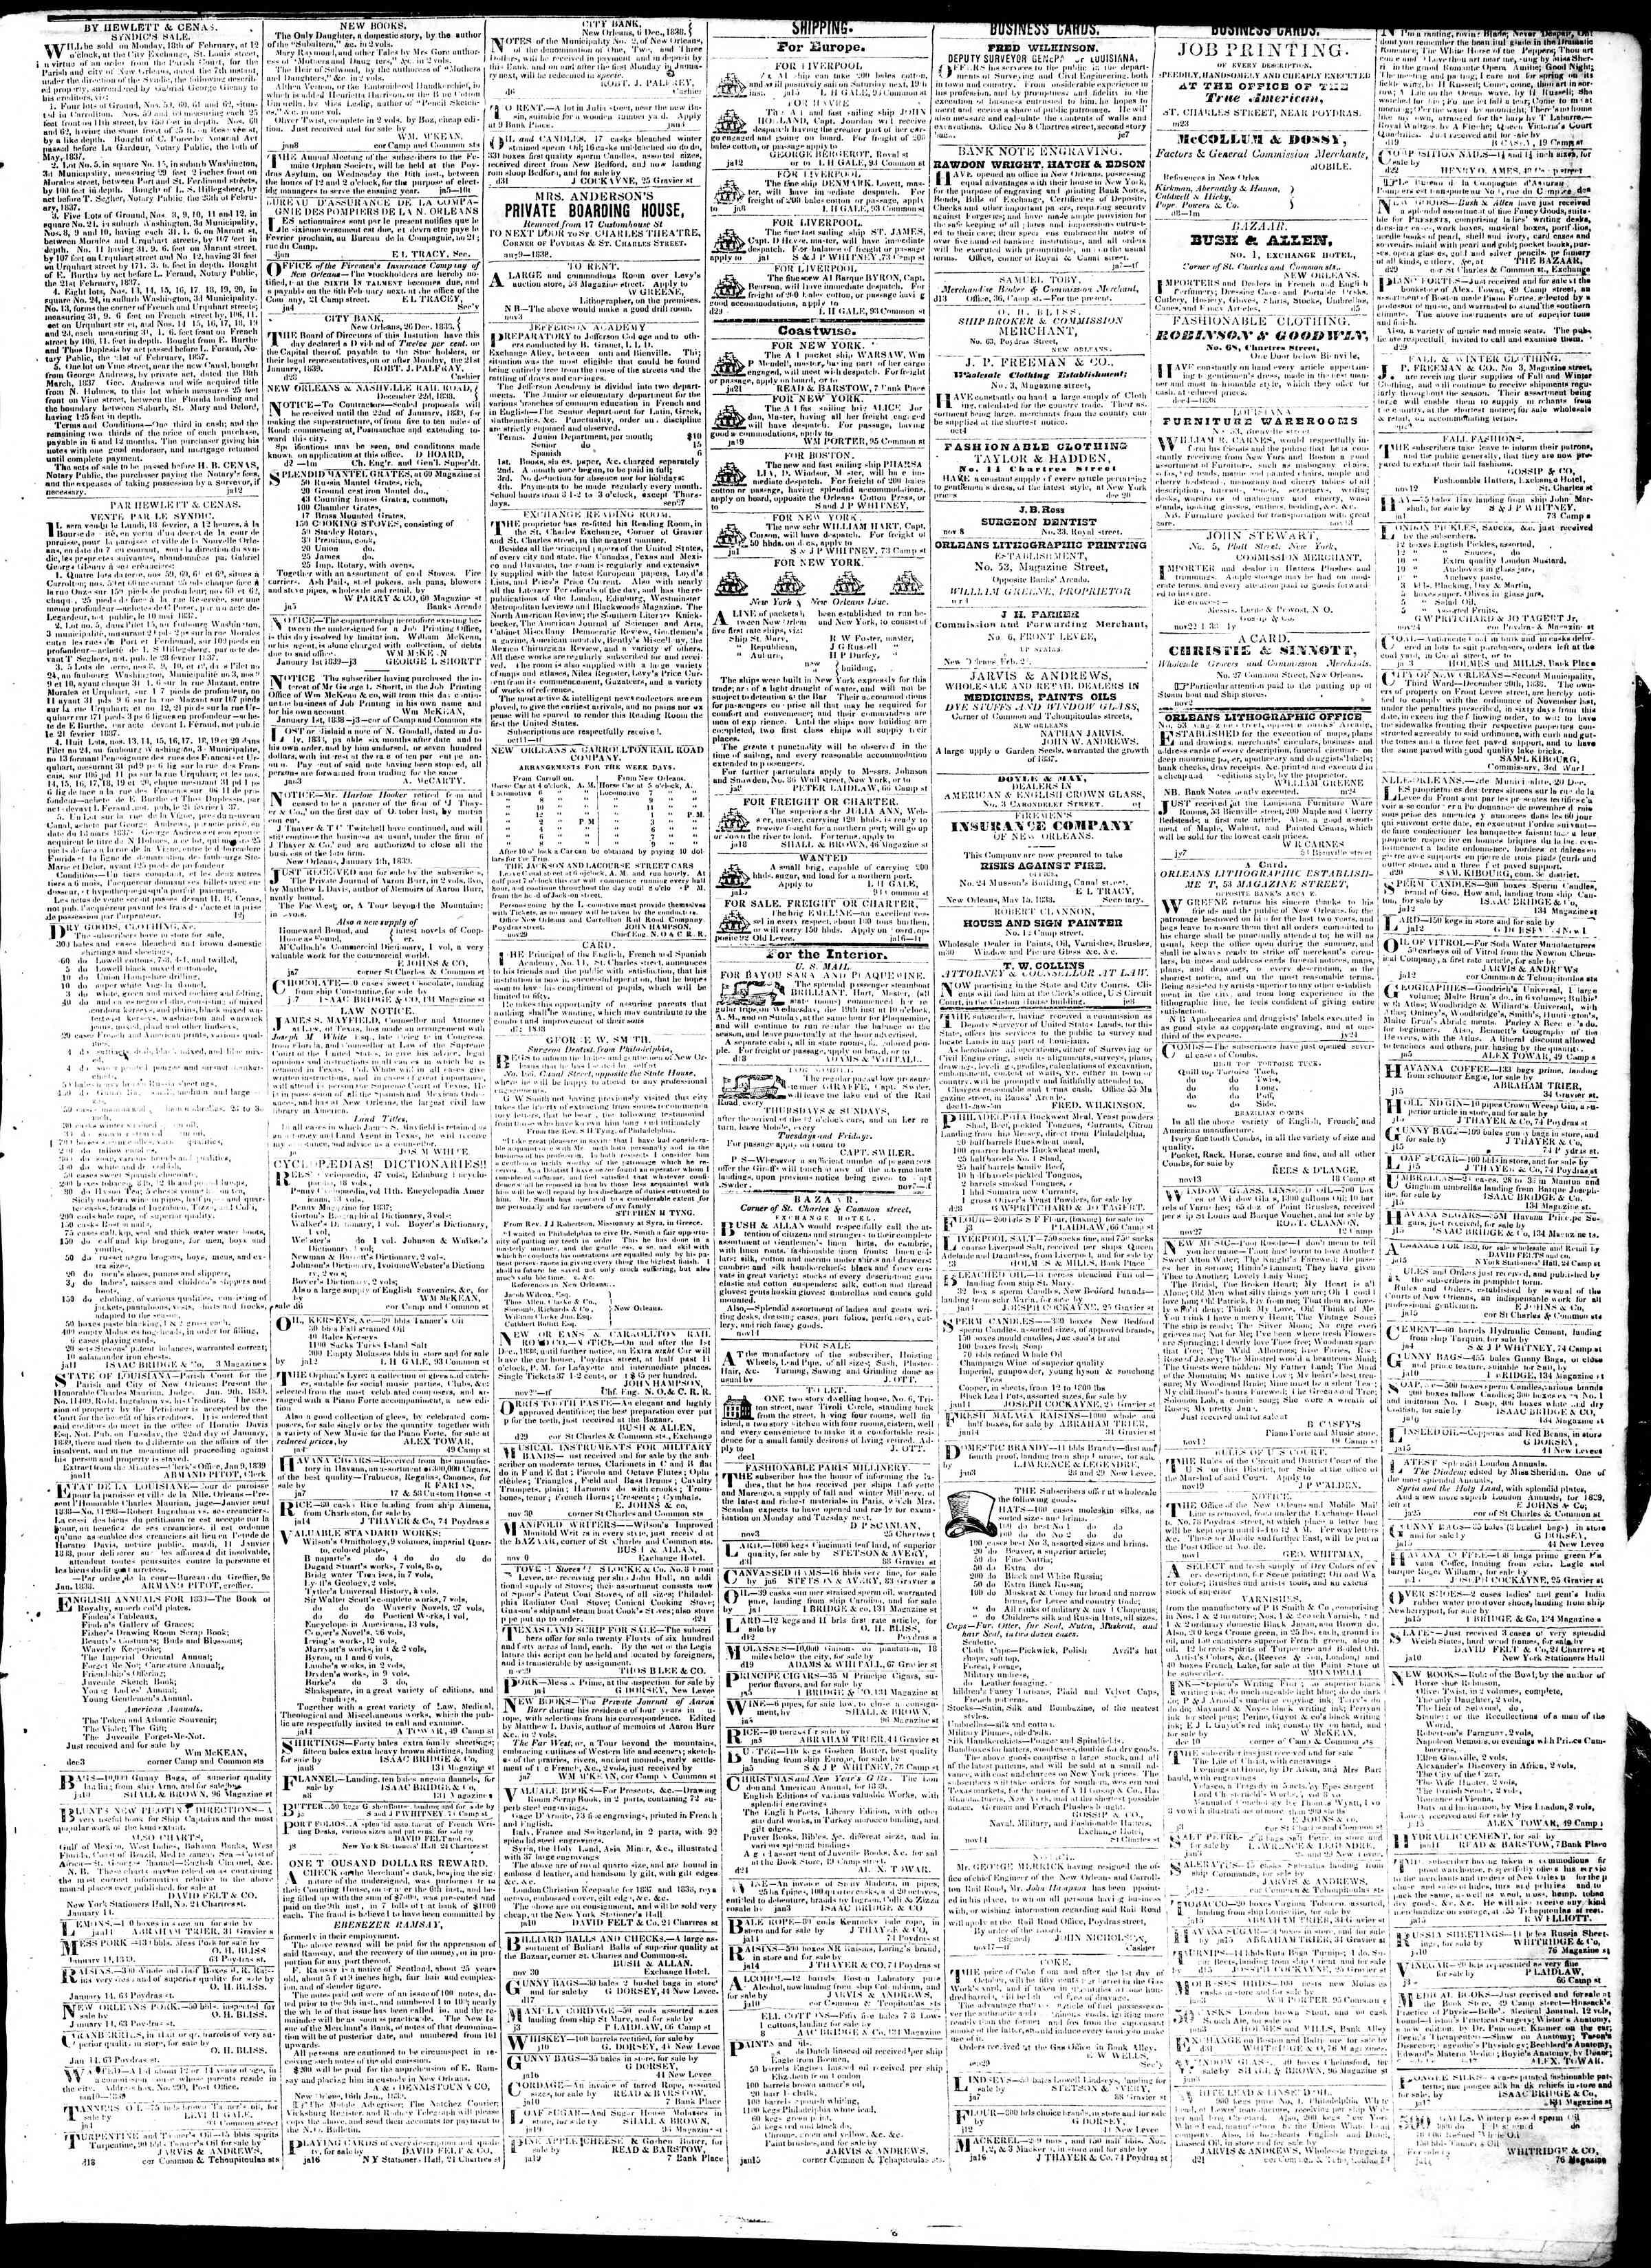 January 22, 1839 Tarihli True American Gazetesi Sayfa 3